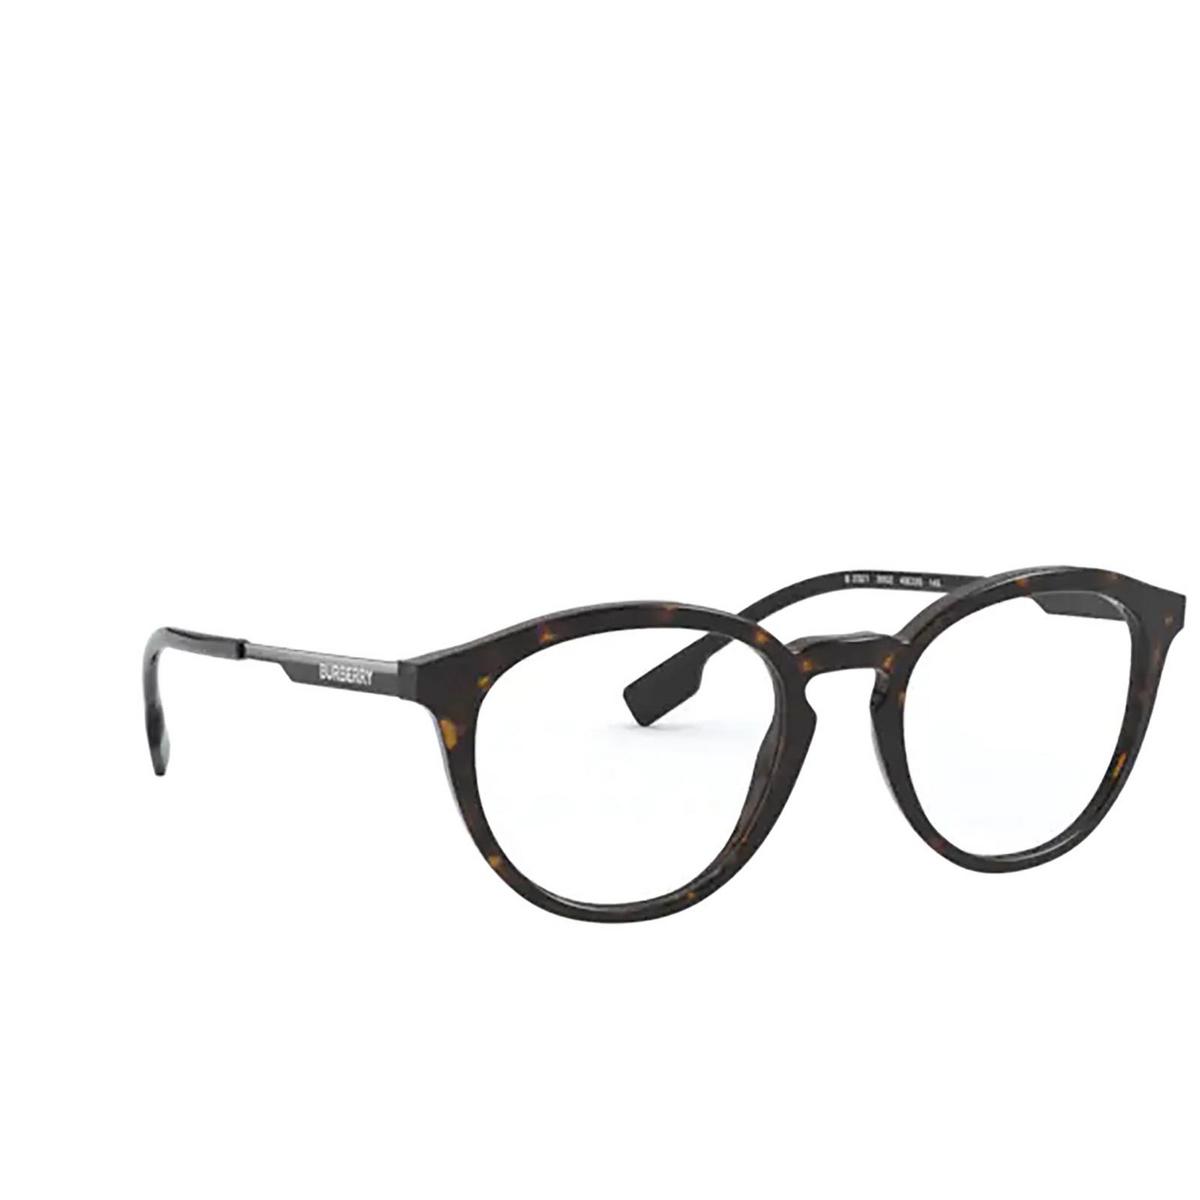 Burberry® Round Eyeglasses: Keats BE2321 color Dark Havana 3002 - three-quarters view.